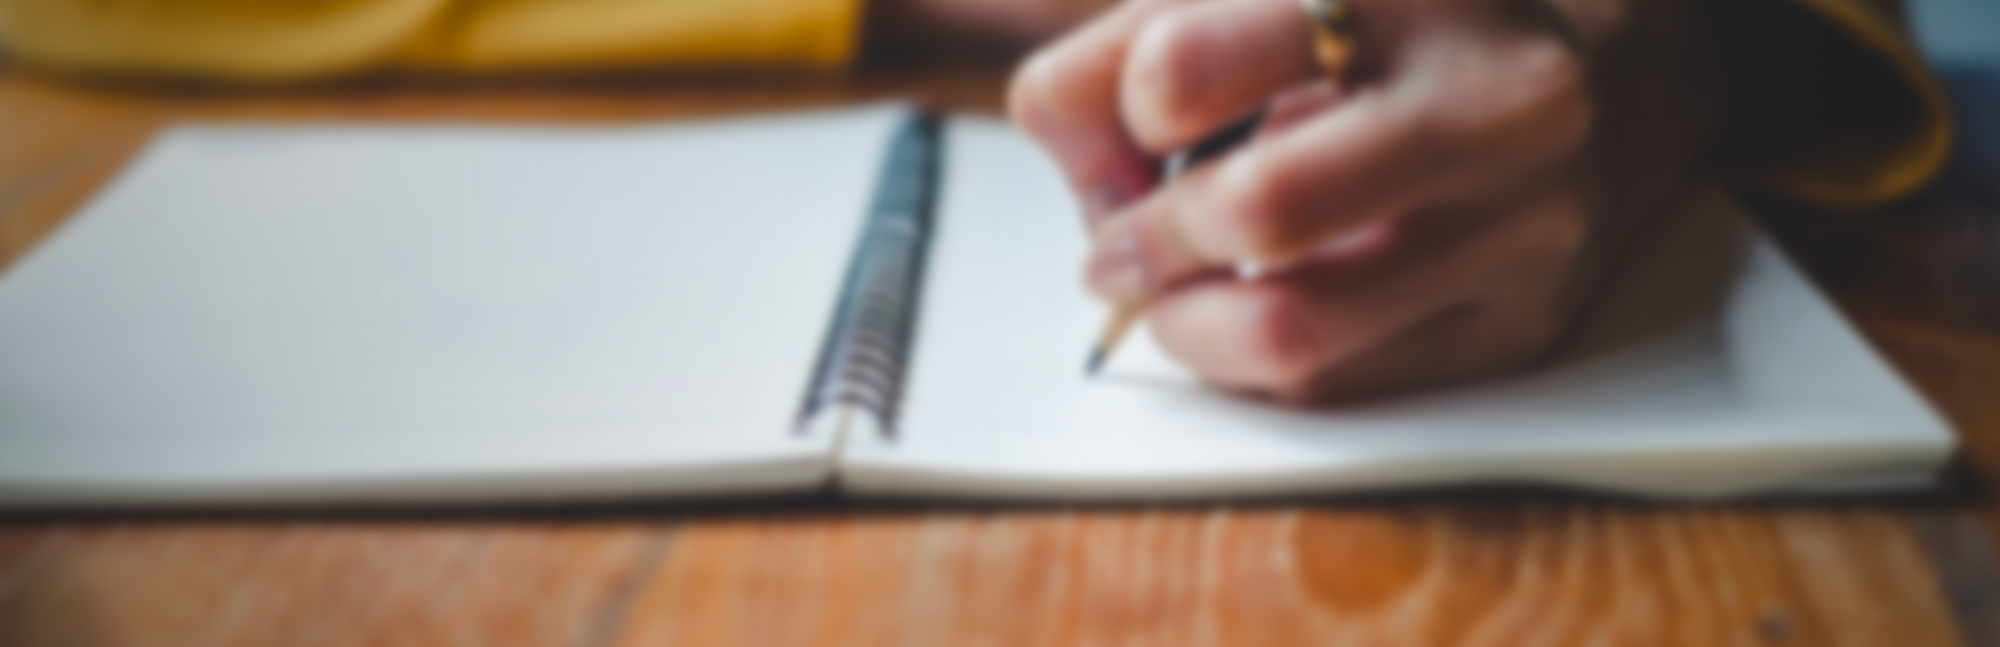 Writing - Creative Community Project